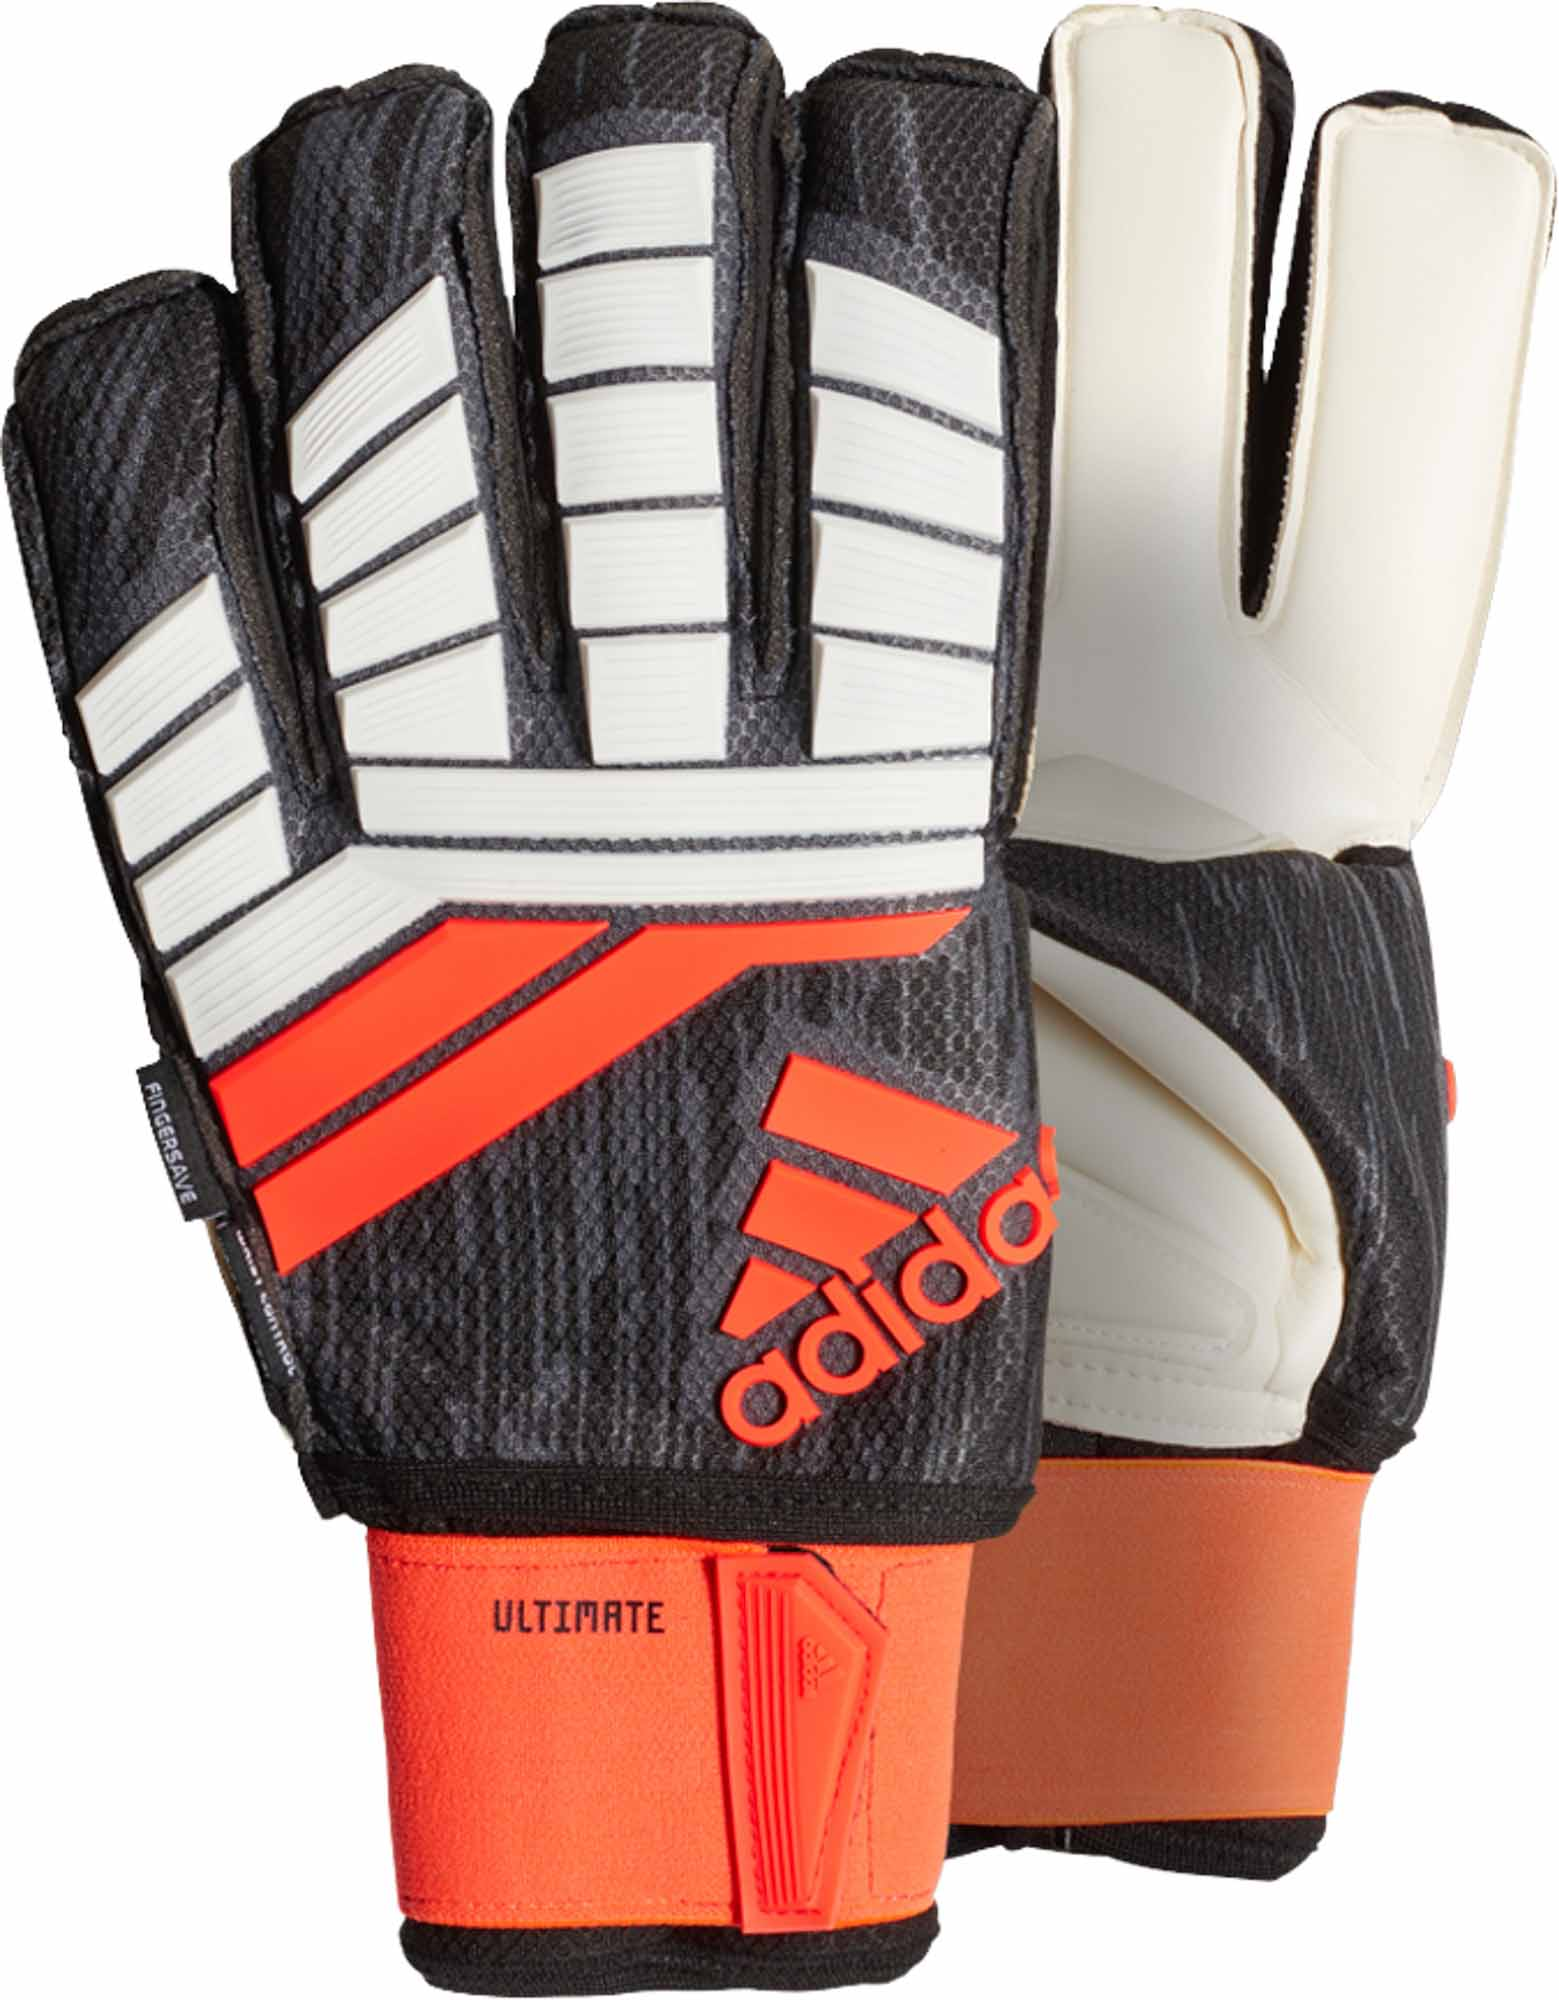 wholesale dealer df3b1 f6dd3 ... ireland adidas predator ultimate goalkeeper gloves solar red black  e042f 524e2